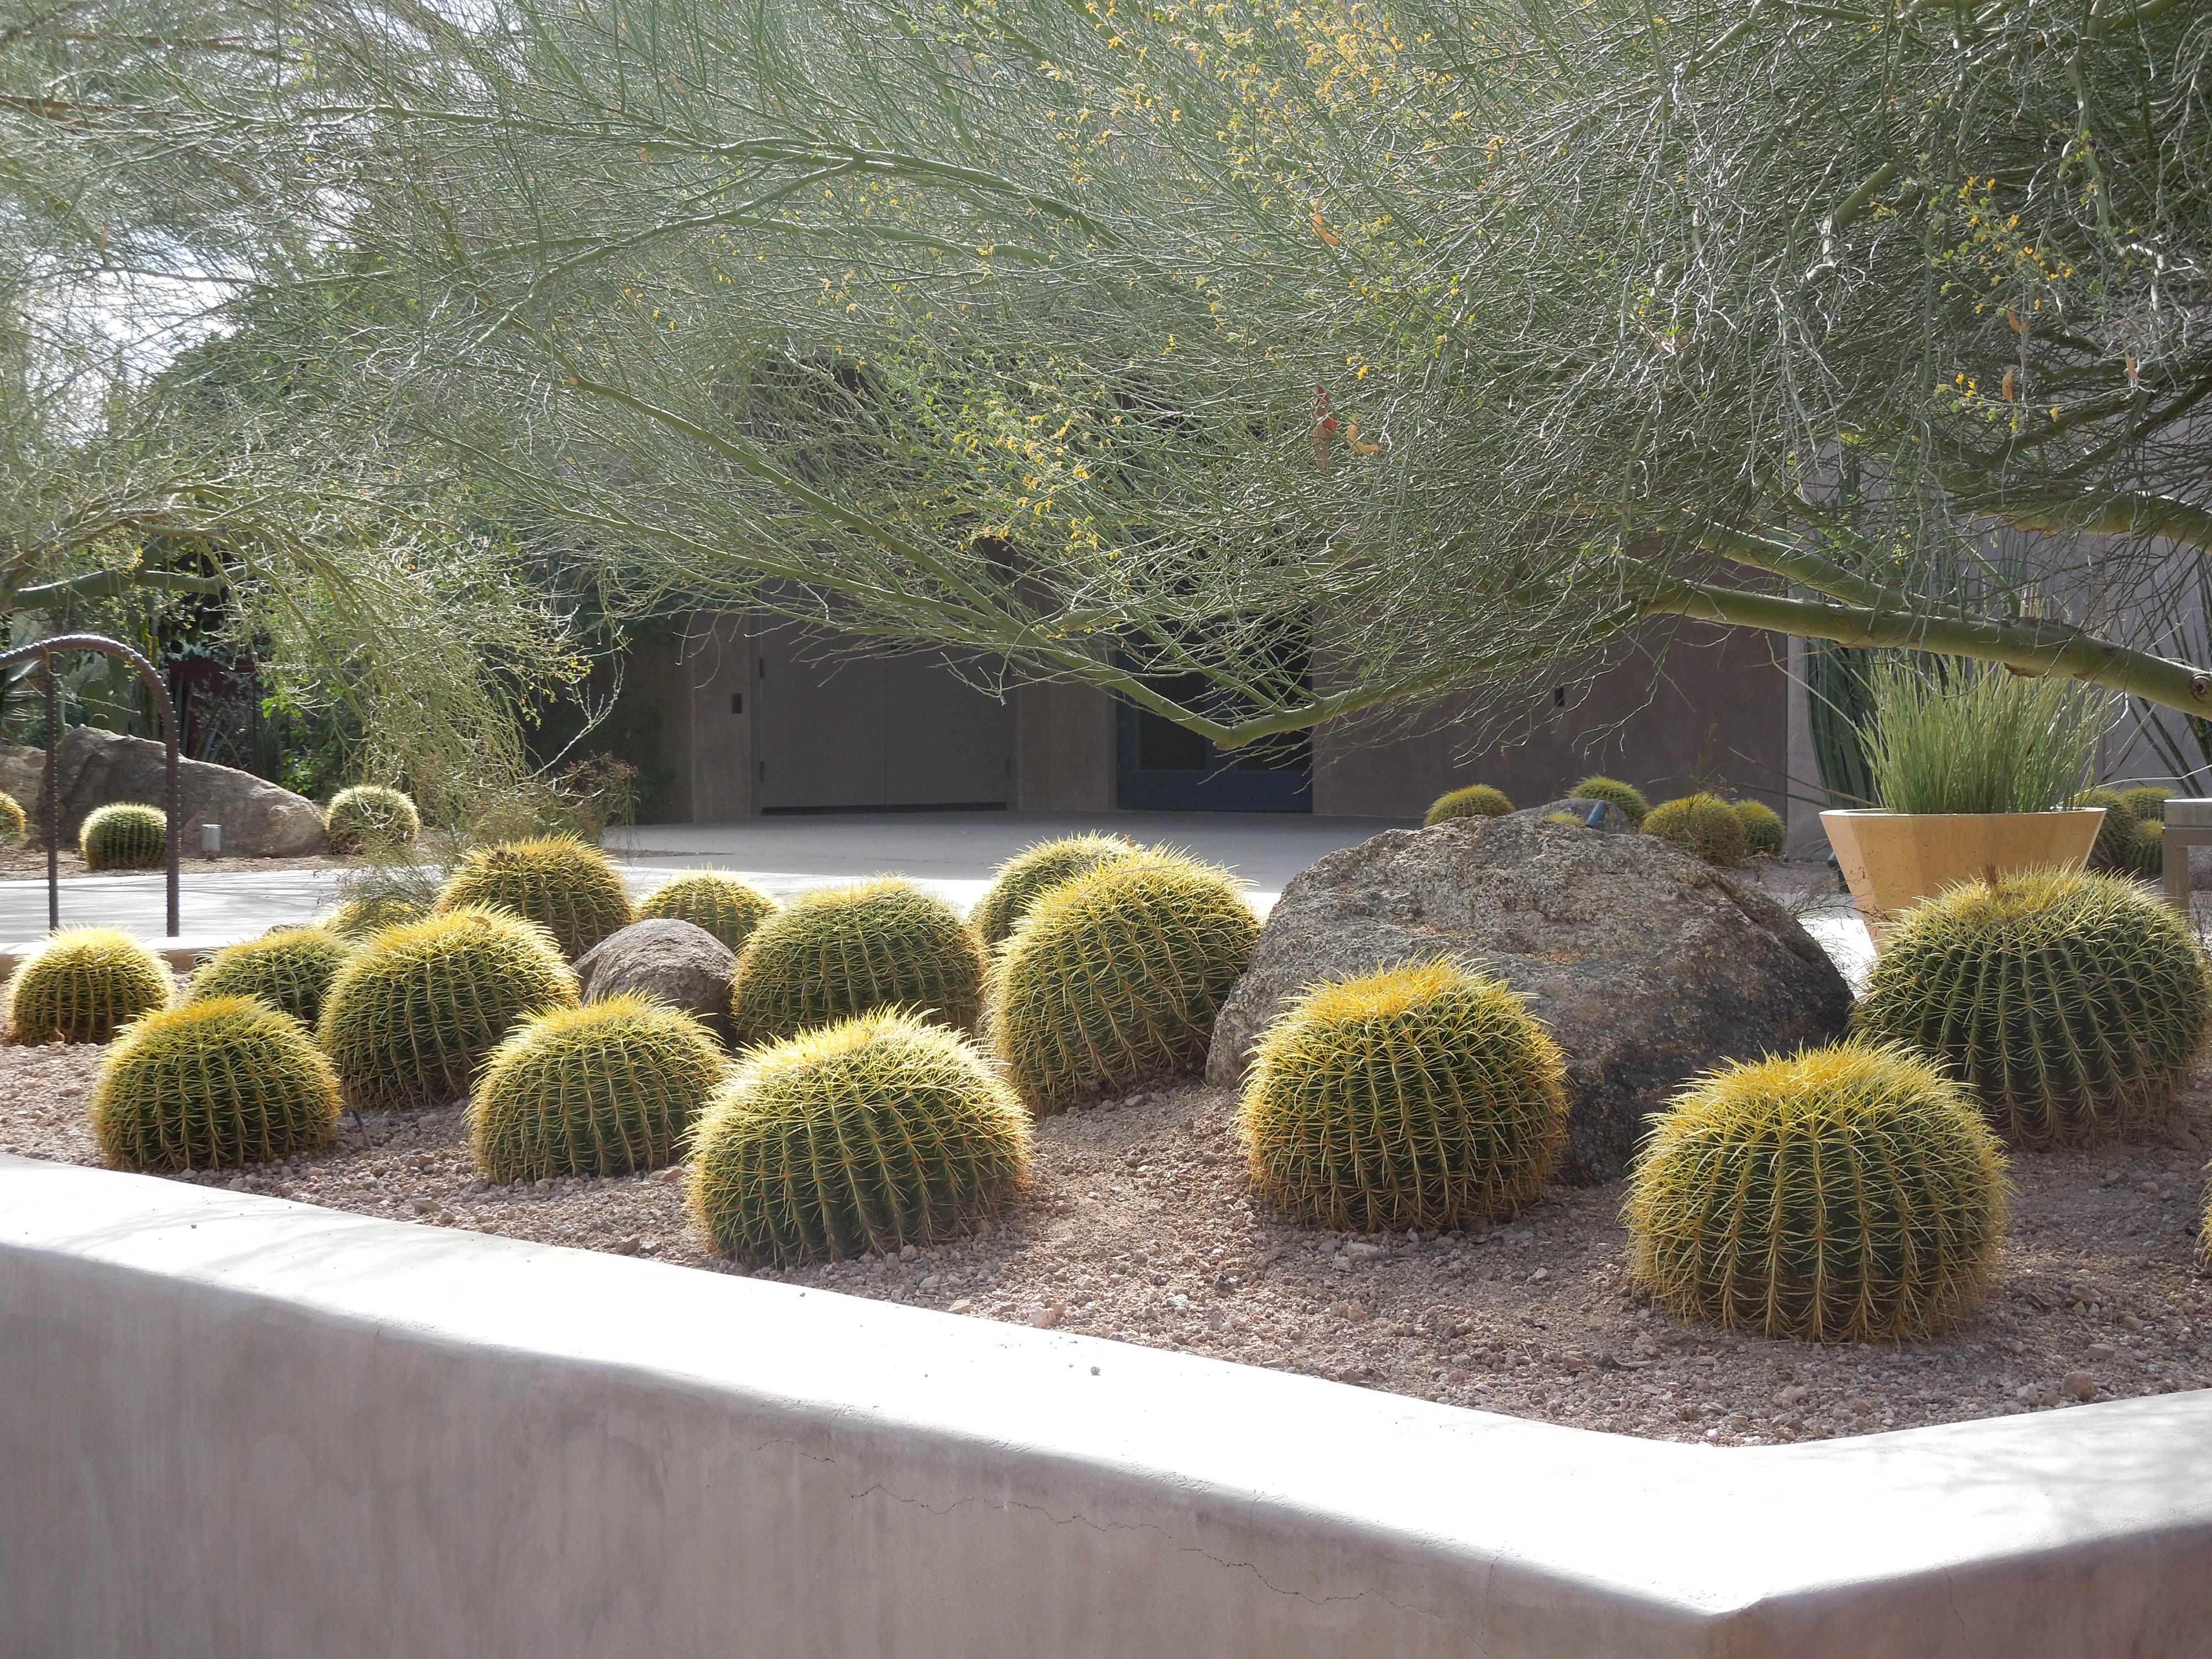 File:Desert Botanical Garden Phoenix Arizona 45.JPG